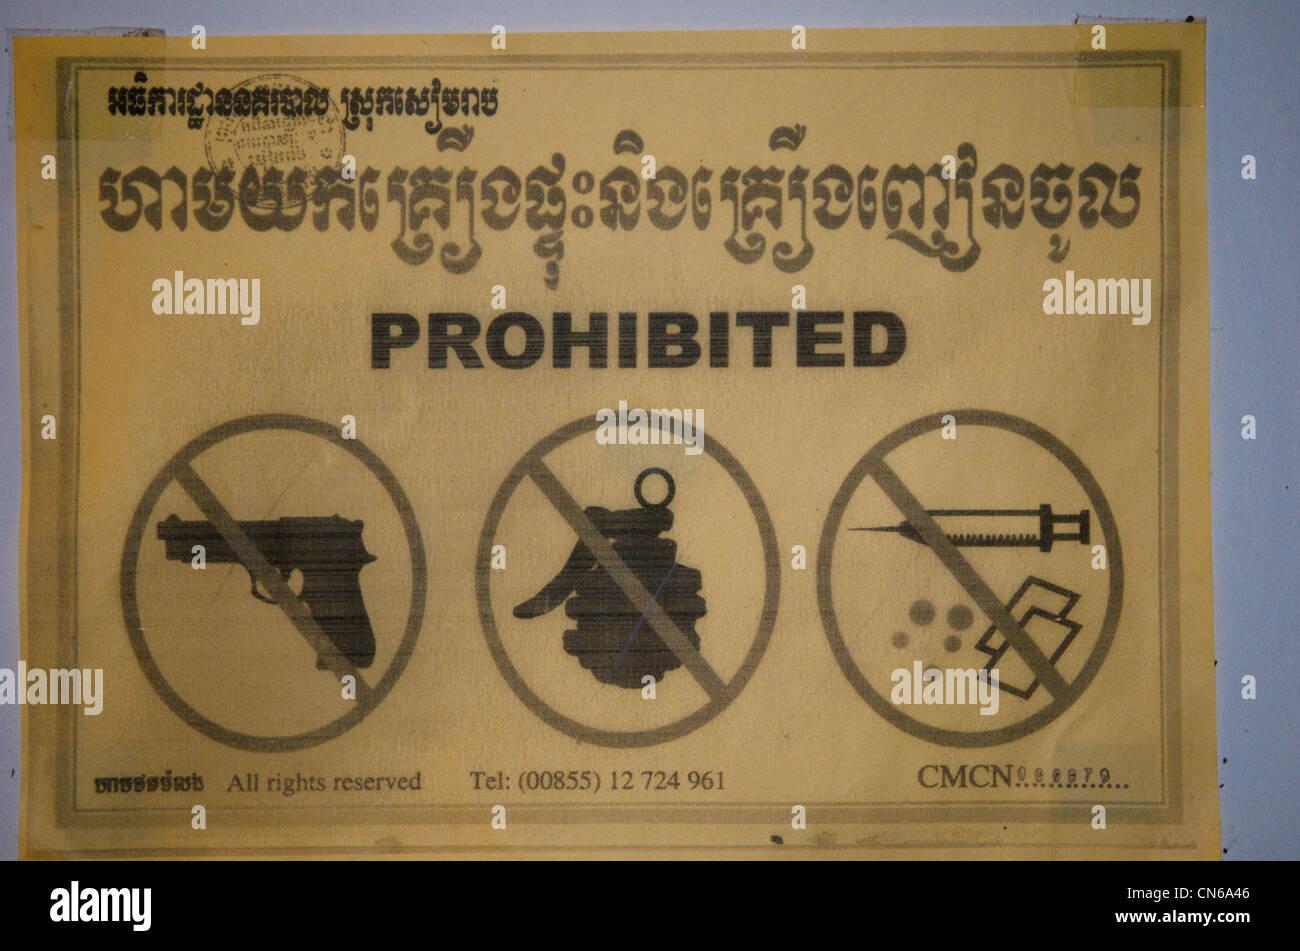 'No guns, hand grenades or drugs' bilingual sign, Siem Reap, Cambodia. credit: Kraig Lieb - Stock Image